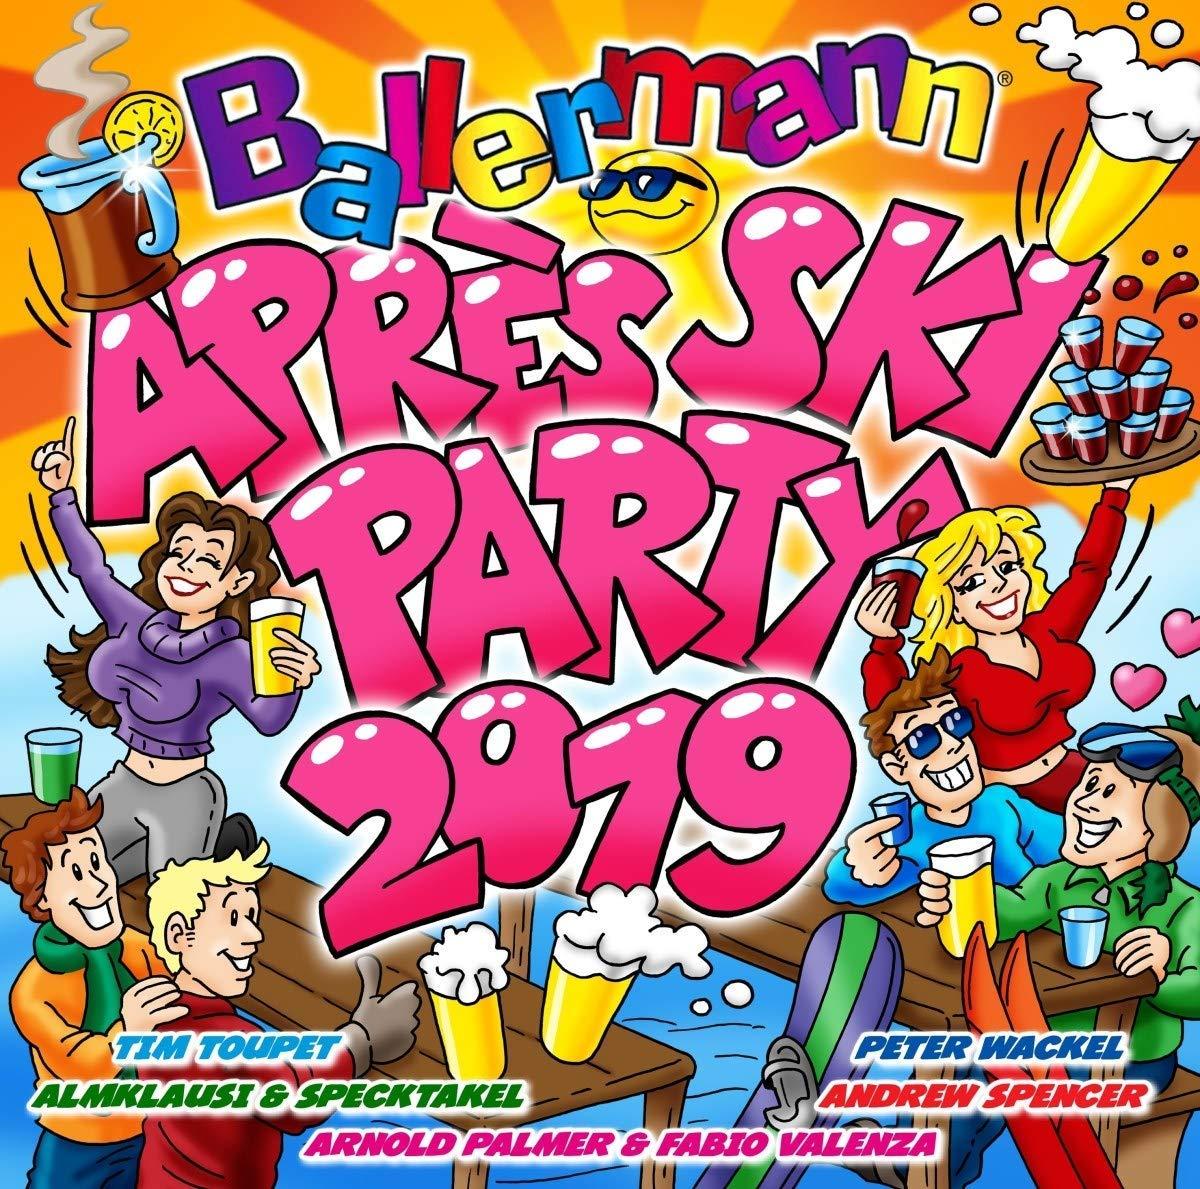 Ballermann Apres Ski Party 2019 (2018) MP3